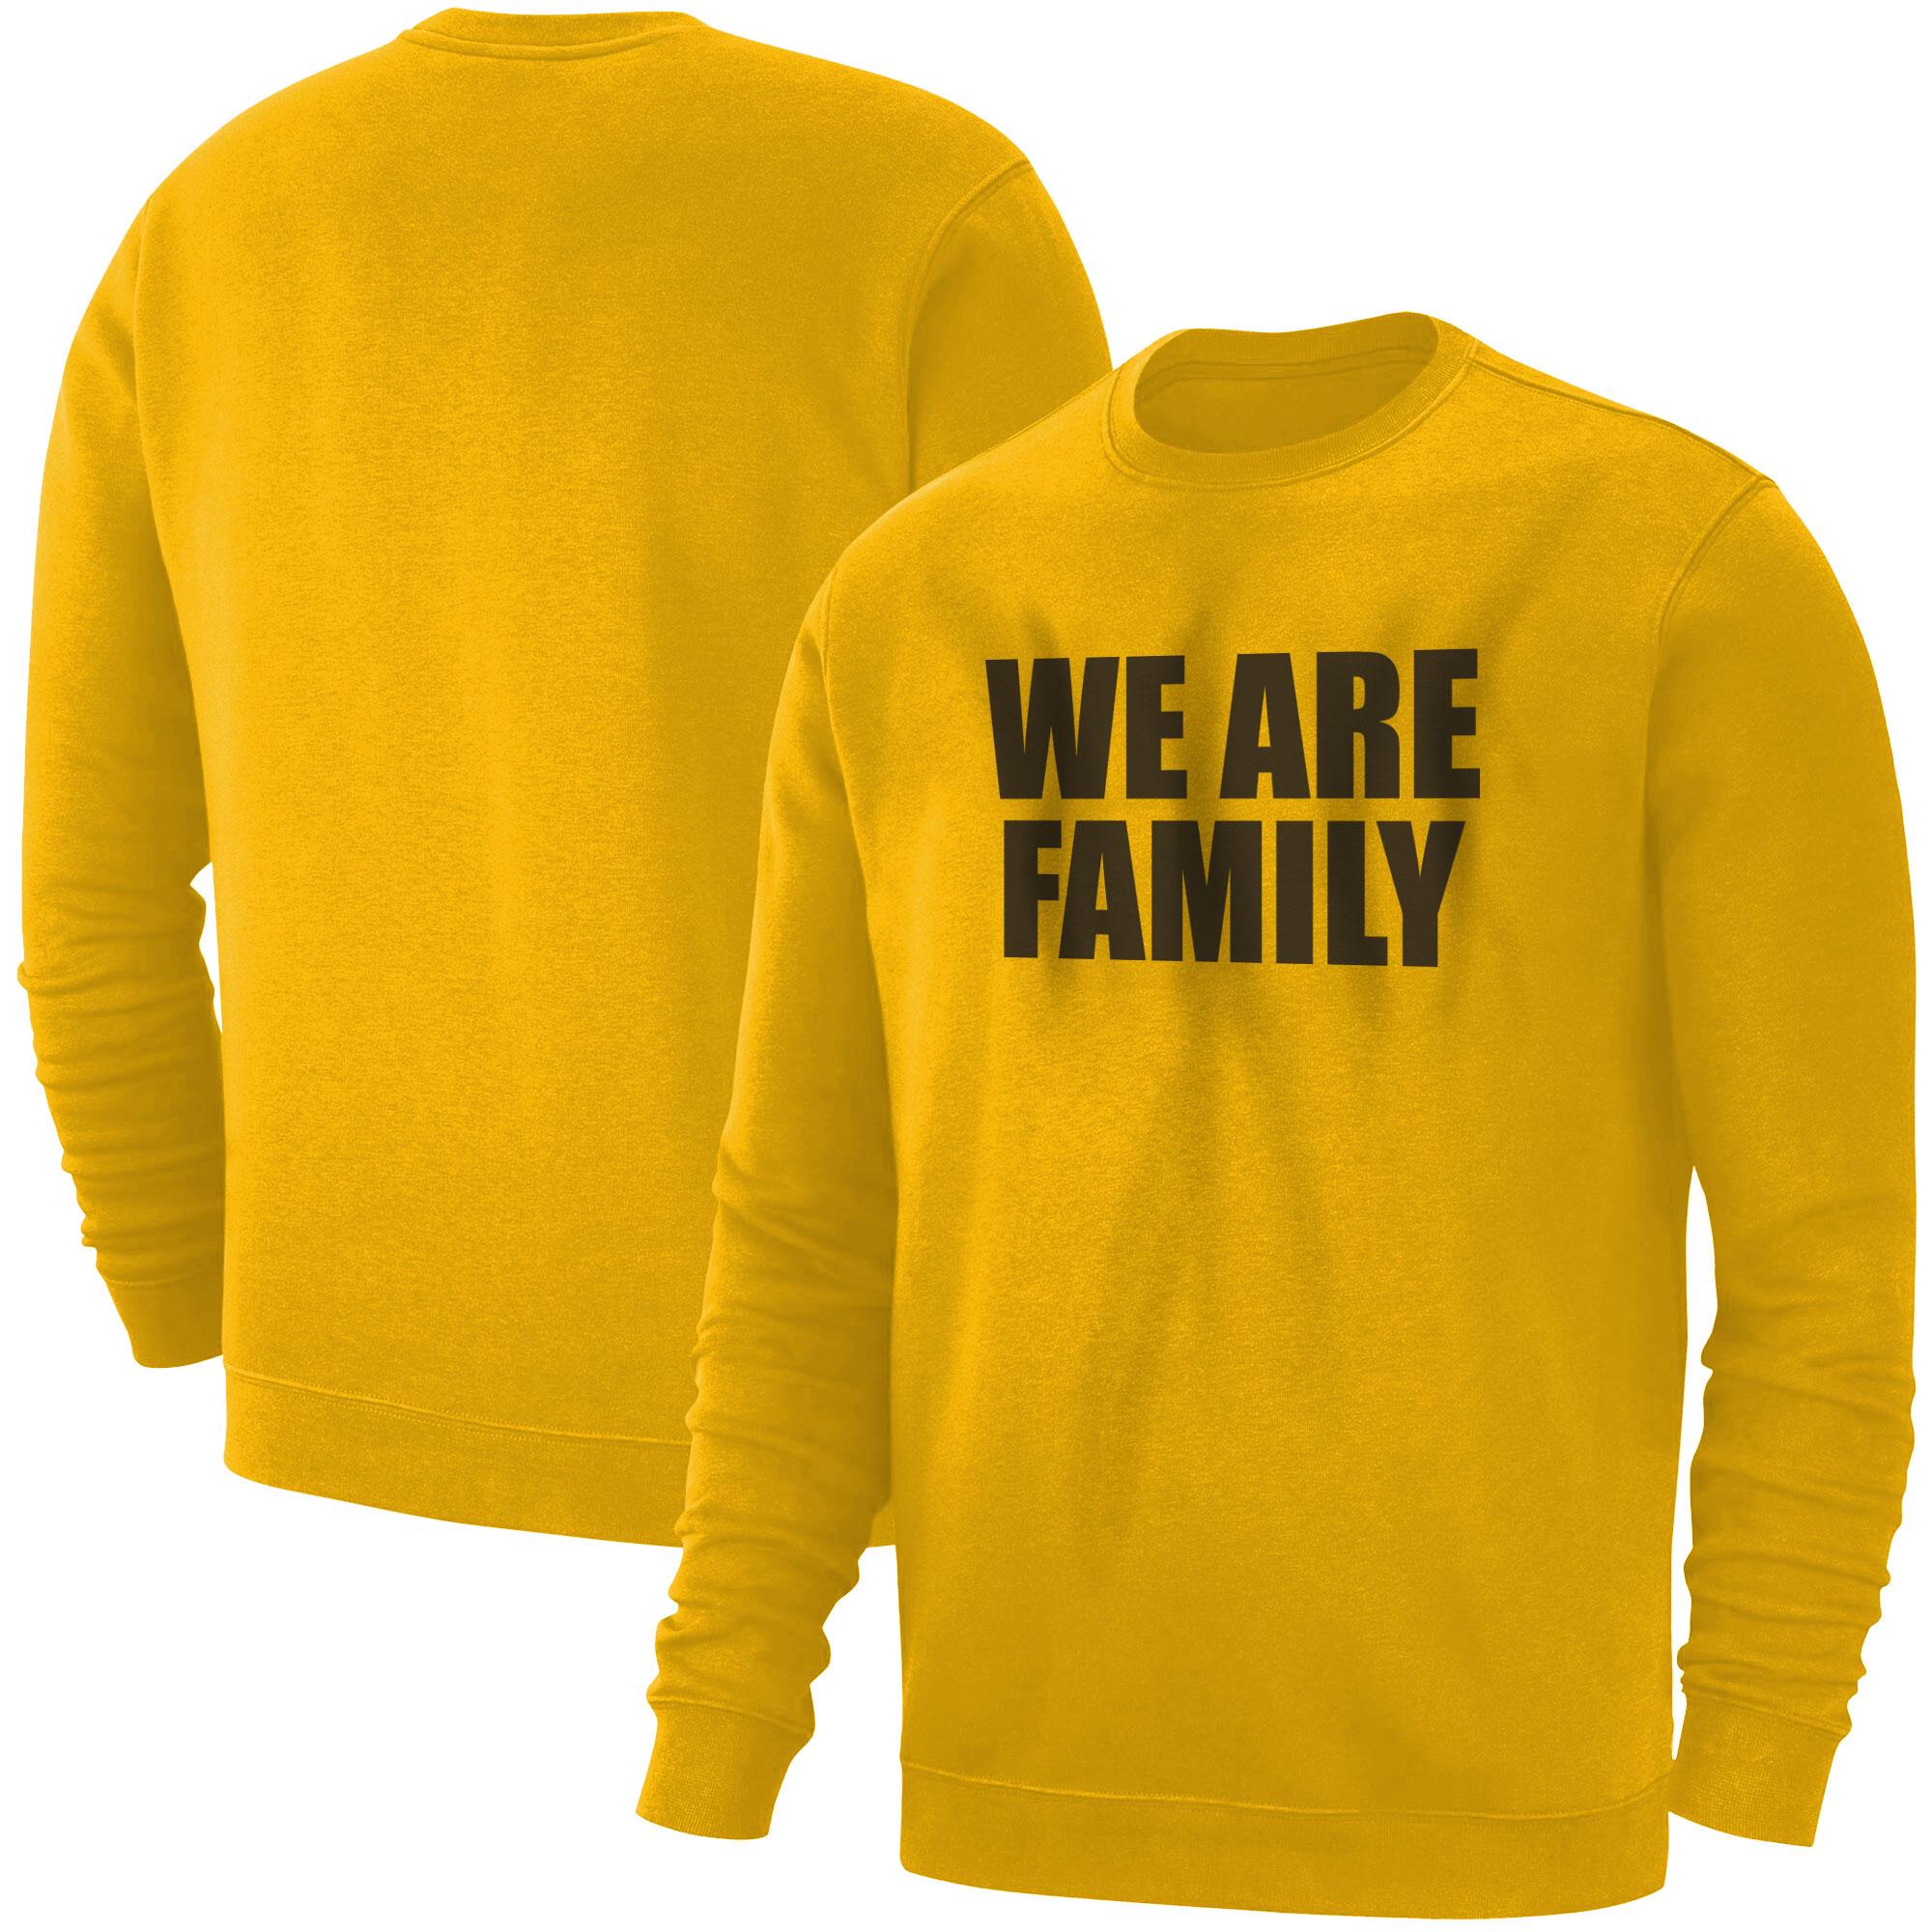 Nba Logo Gear We Are Family Basic (BSC-WHT-NP-WSH-BSKTBLL-wefamily-Syh-542)